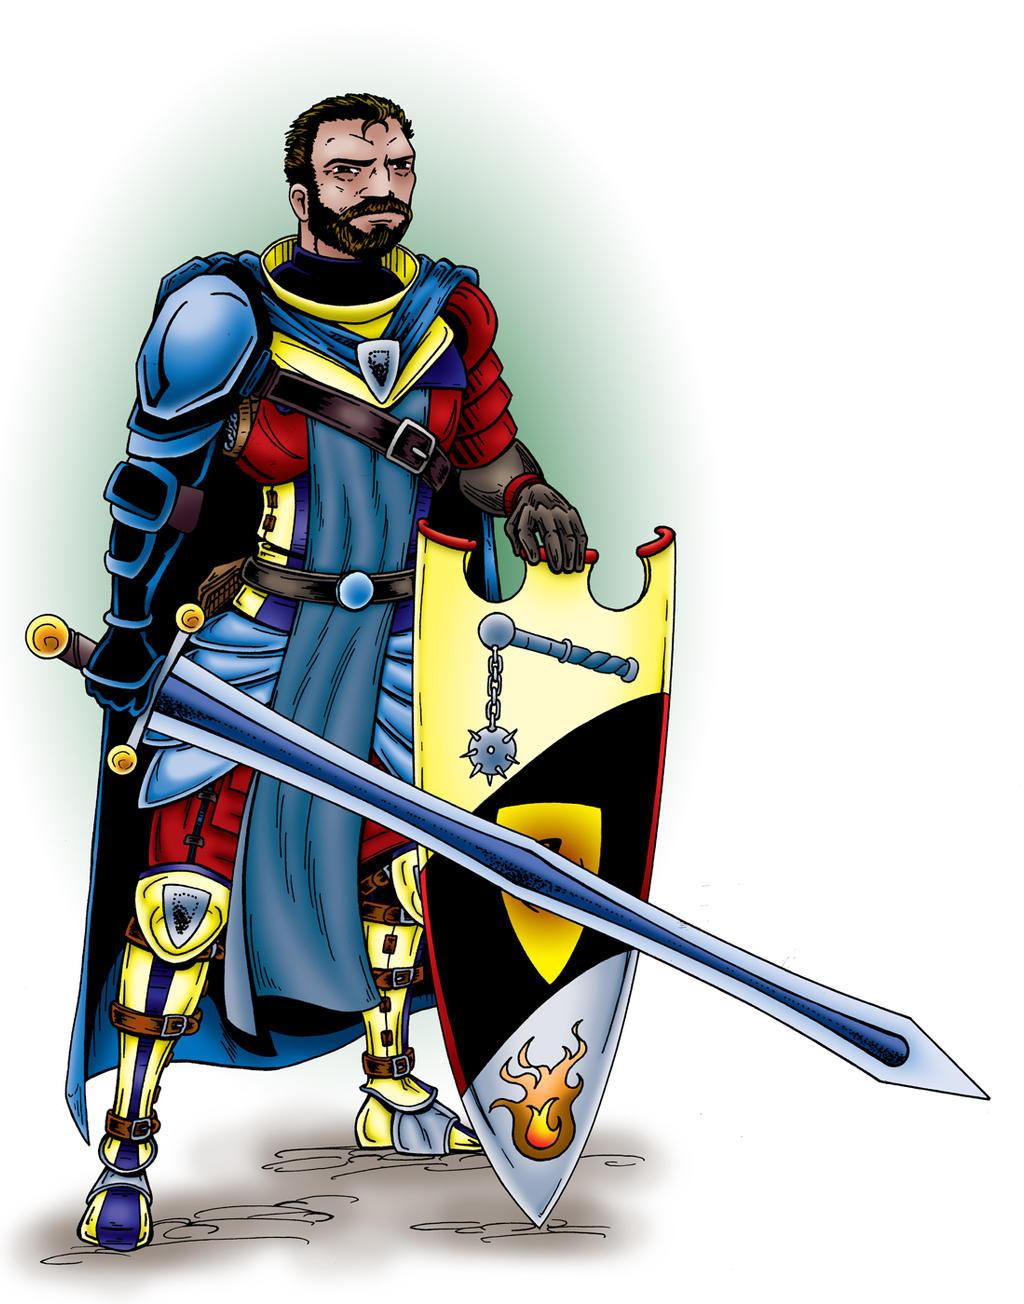 Jacob Wales 100dpi color by MuShinGirl